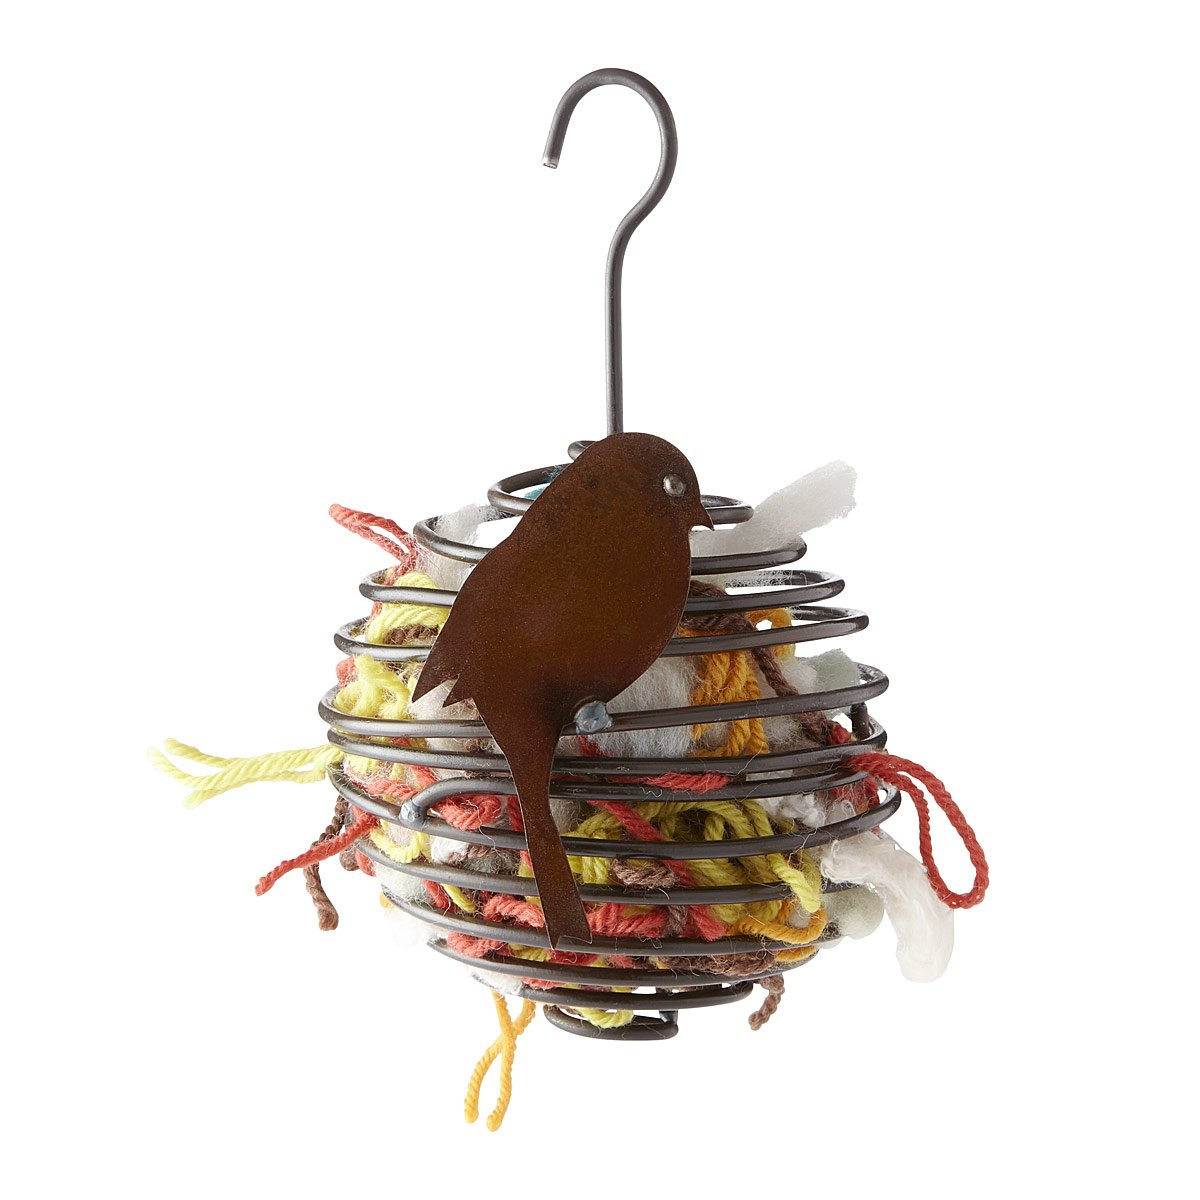 Yarn Nest Starter | UncommonGoods